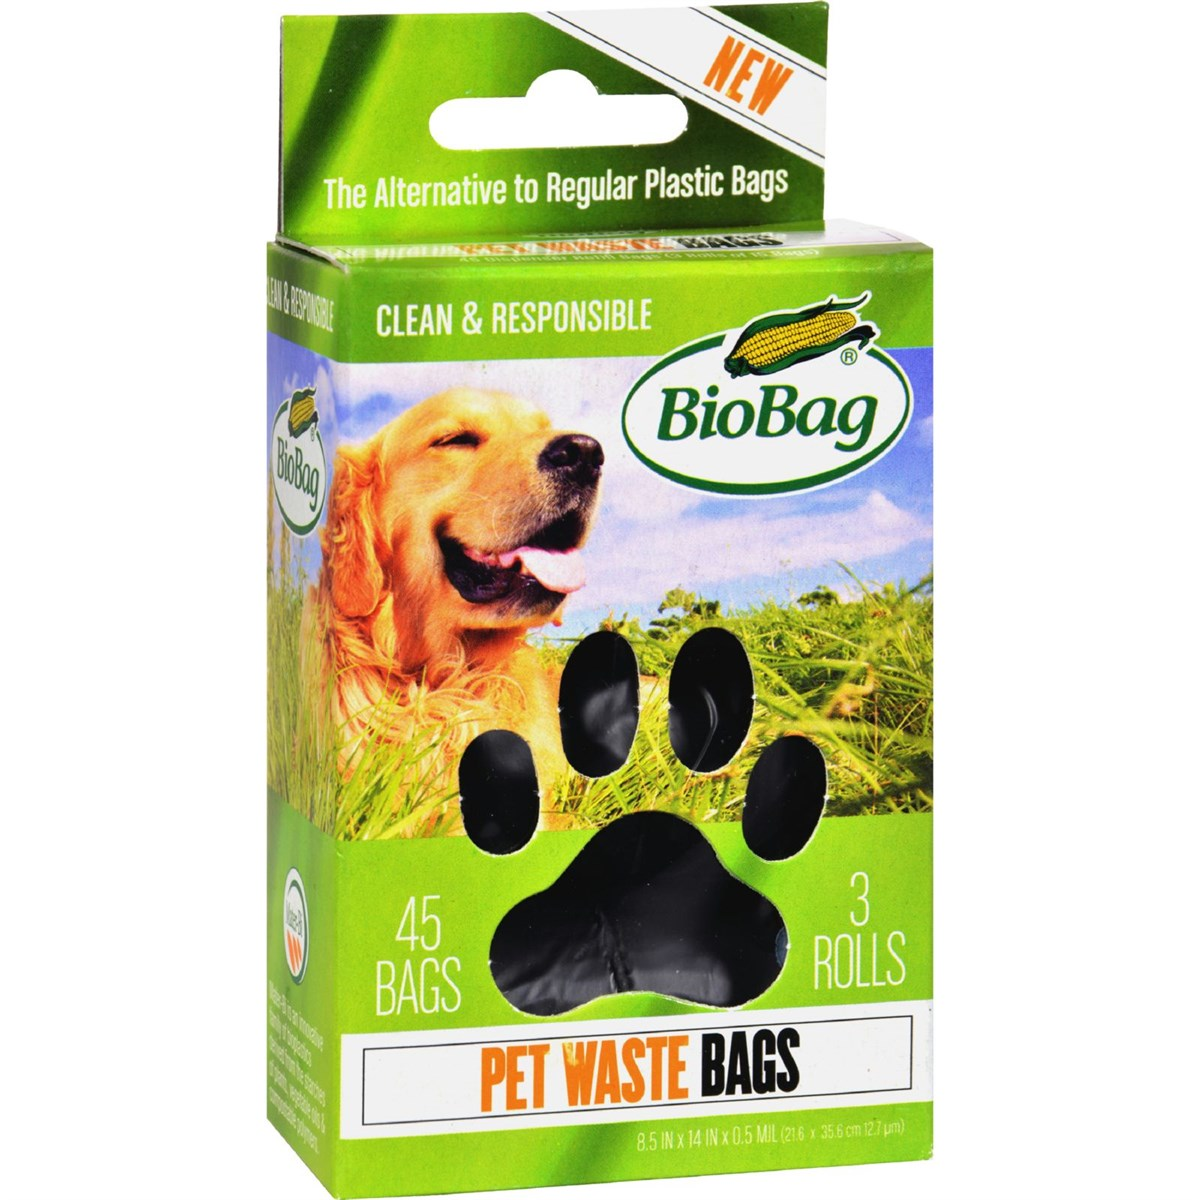 Environmentally Friendly Dog Poop Bags